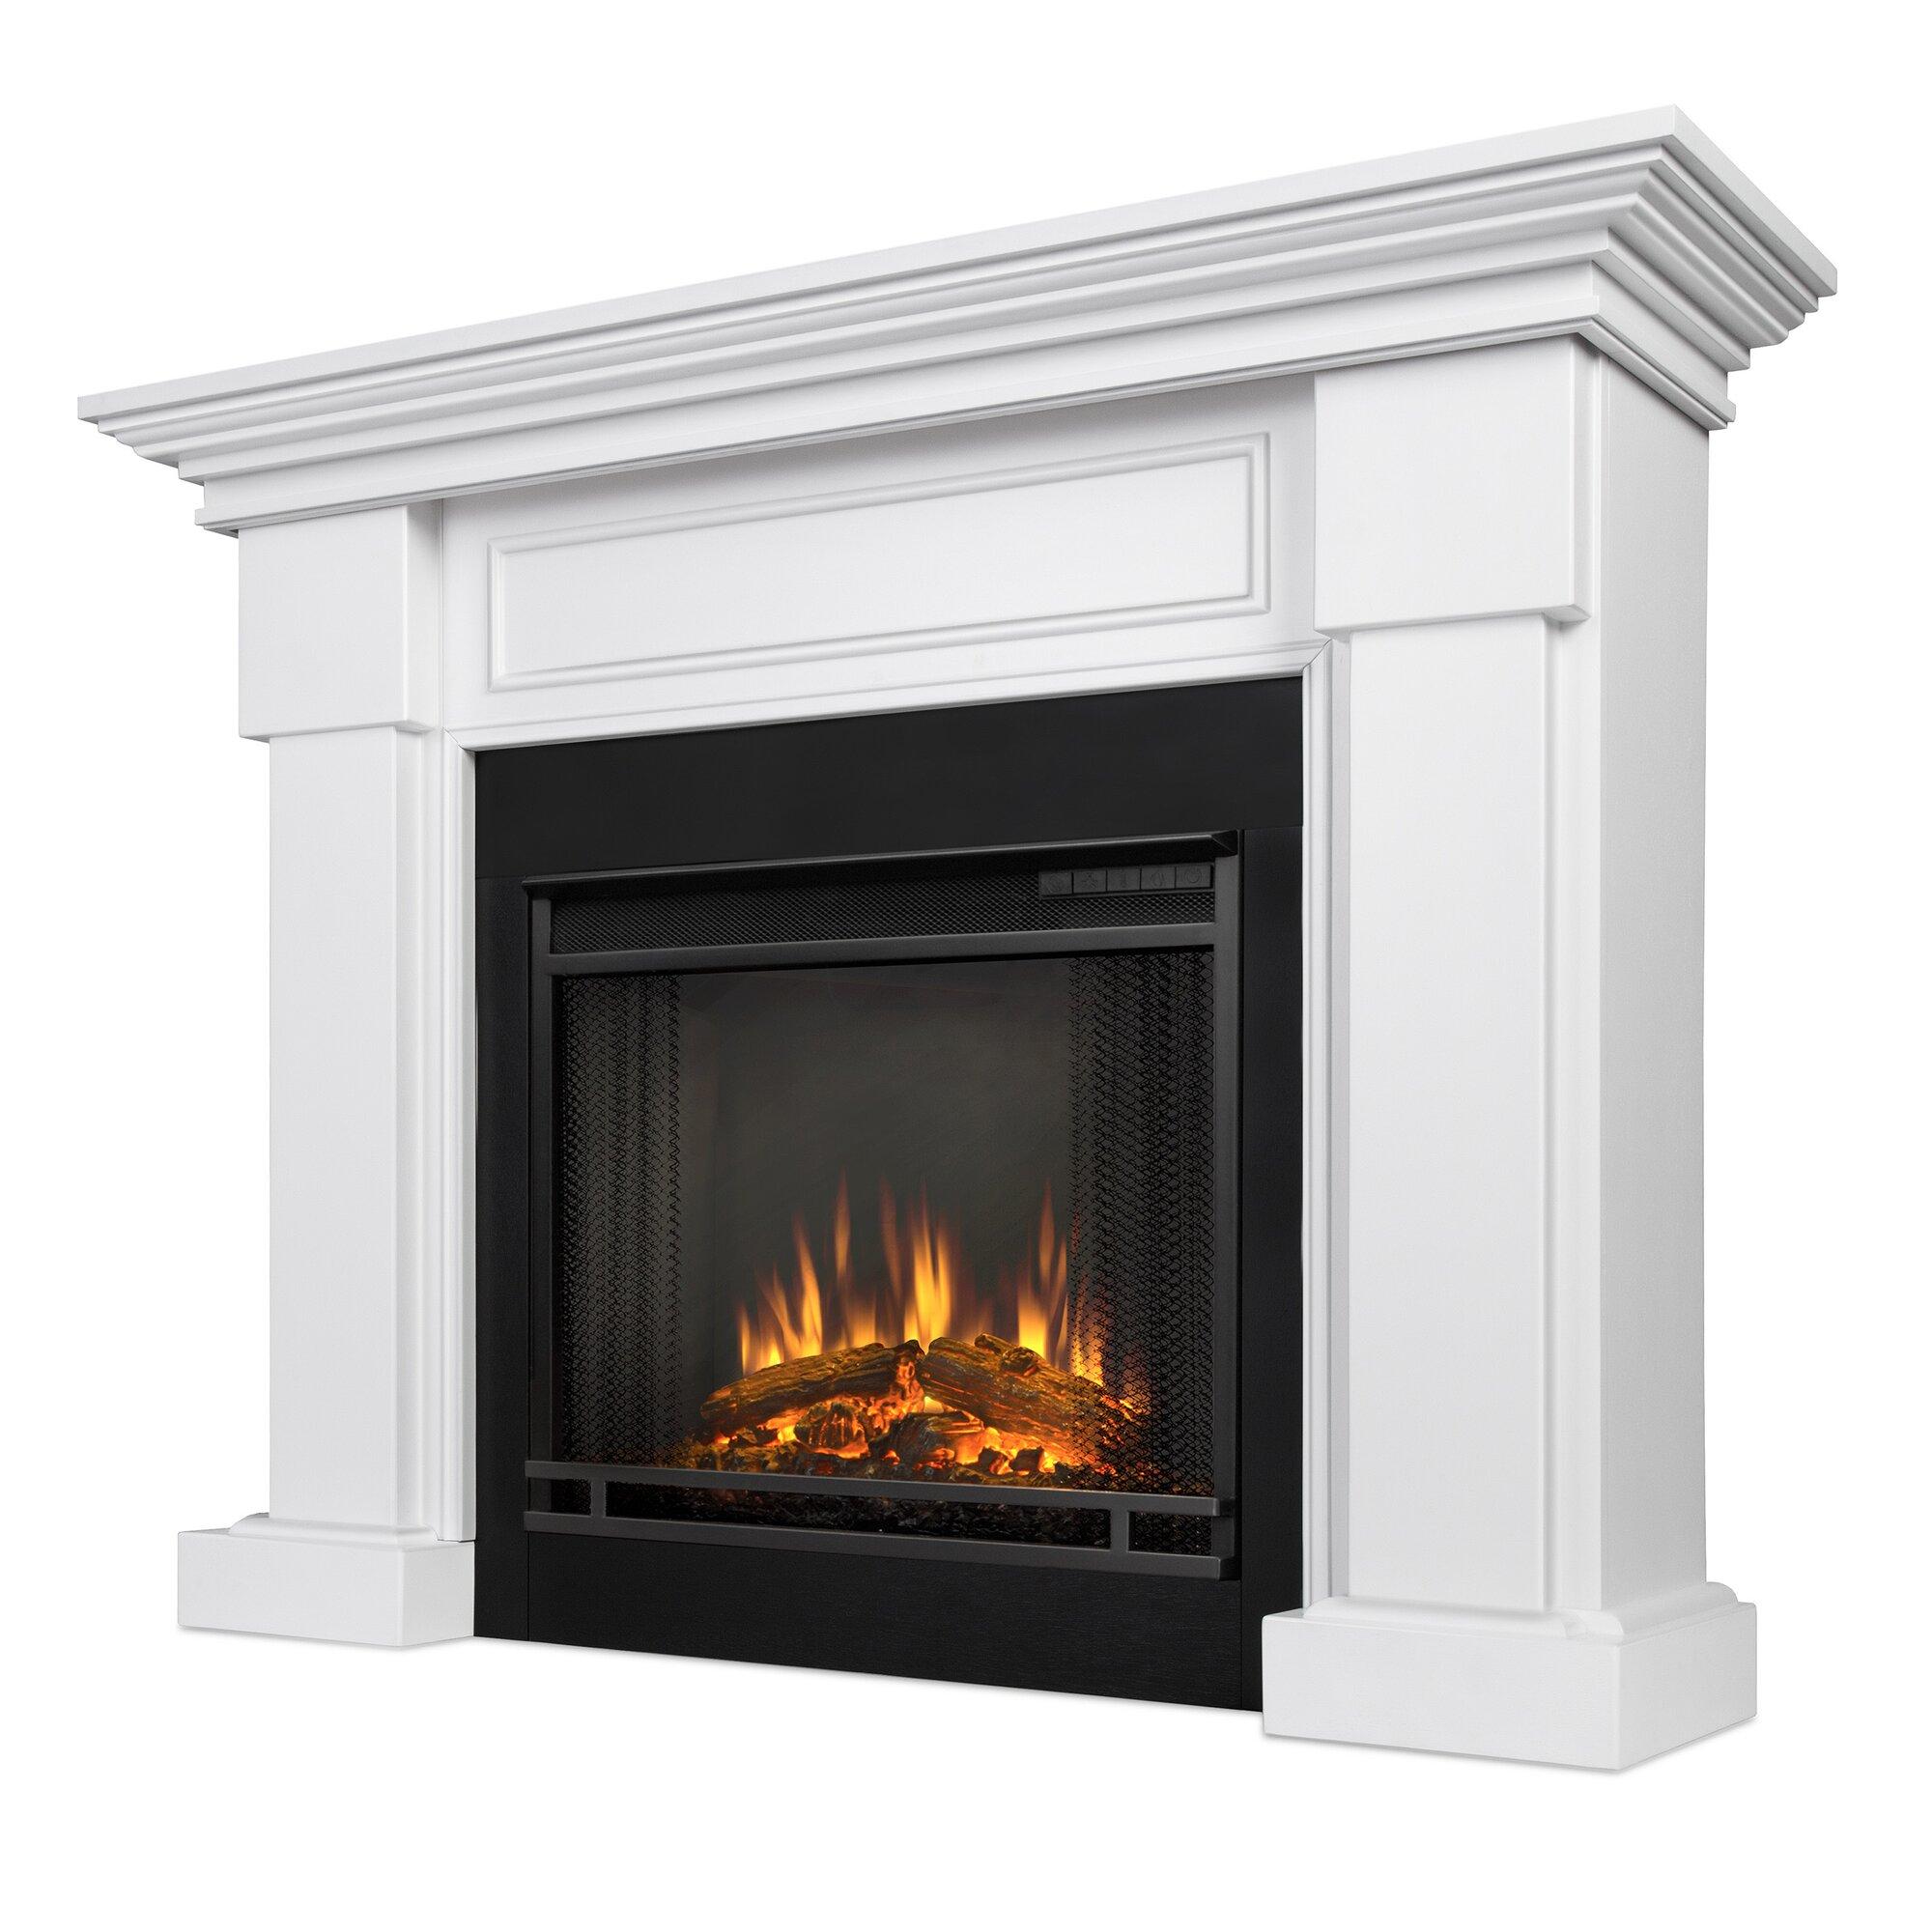 great world ltd electric fireplace manual electric fireplace heat